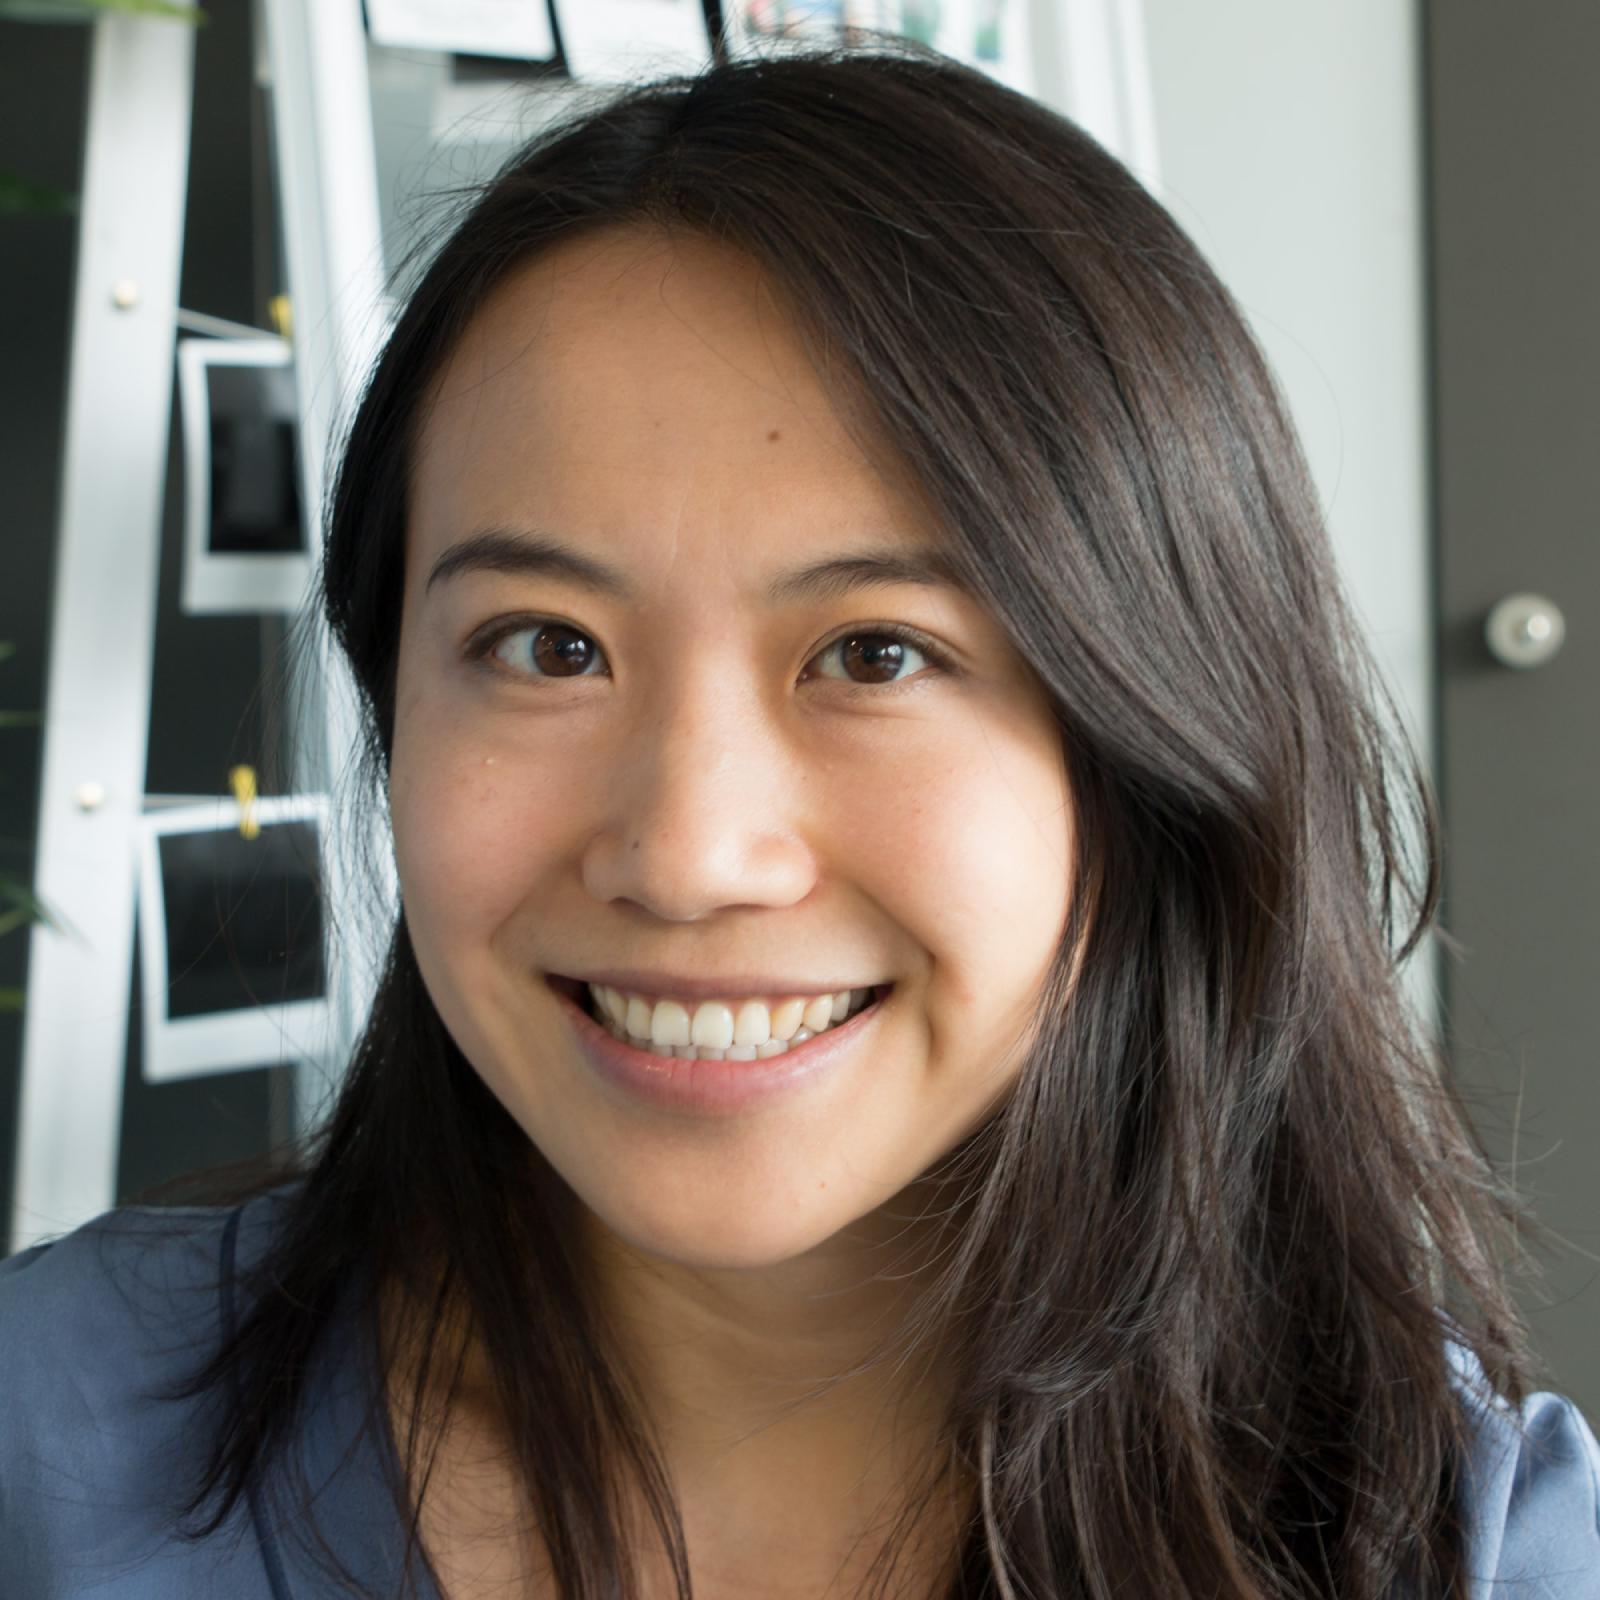 Yuelin Li, VP strategy at Onfido